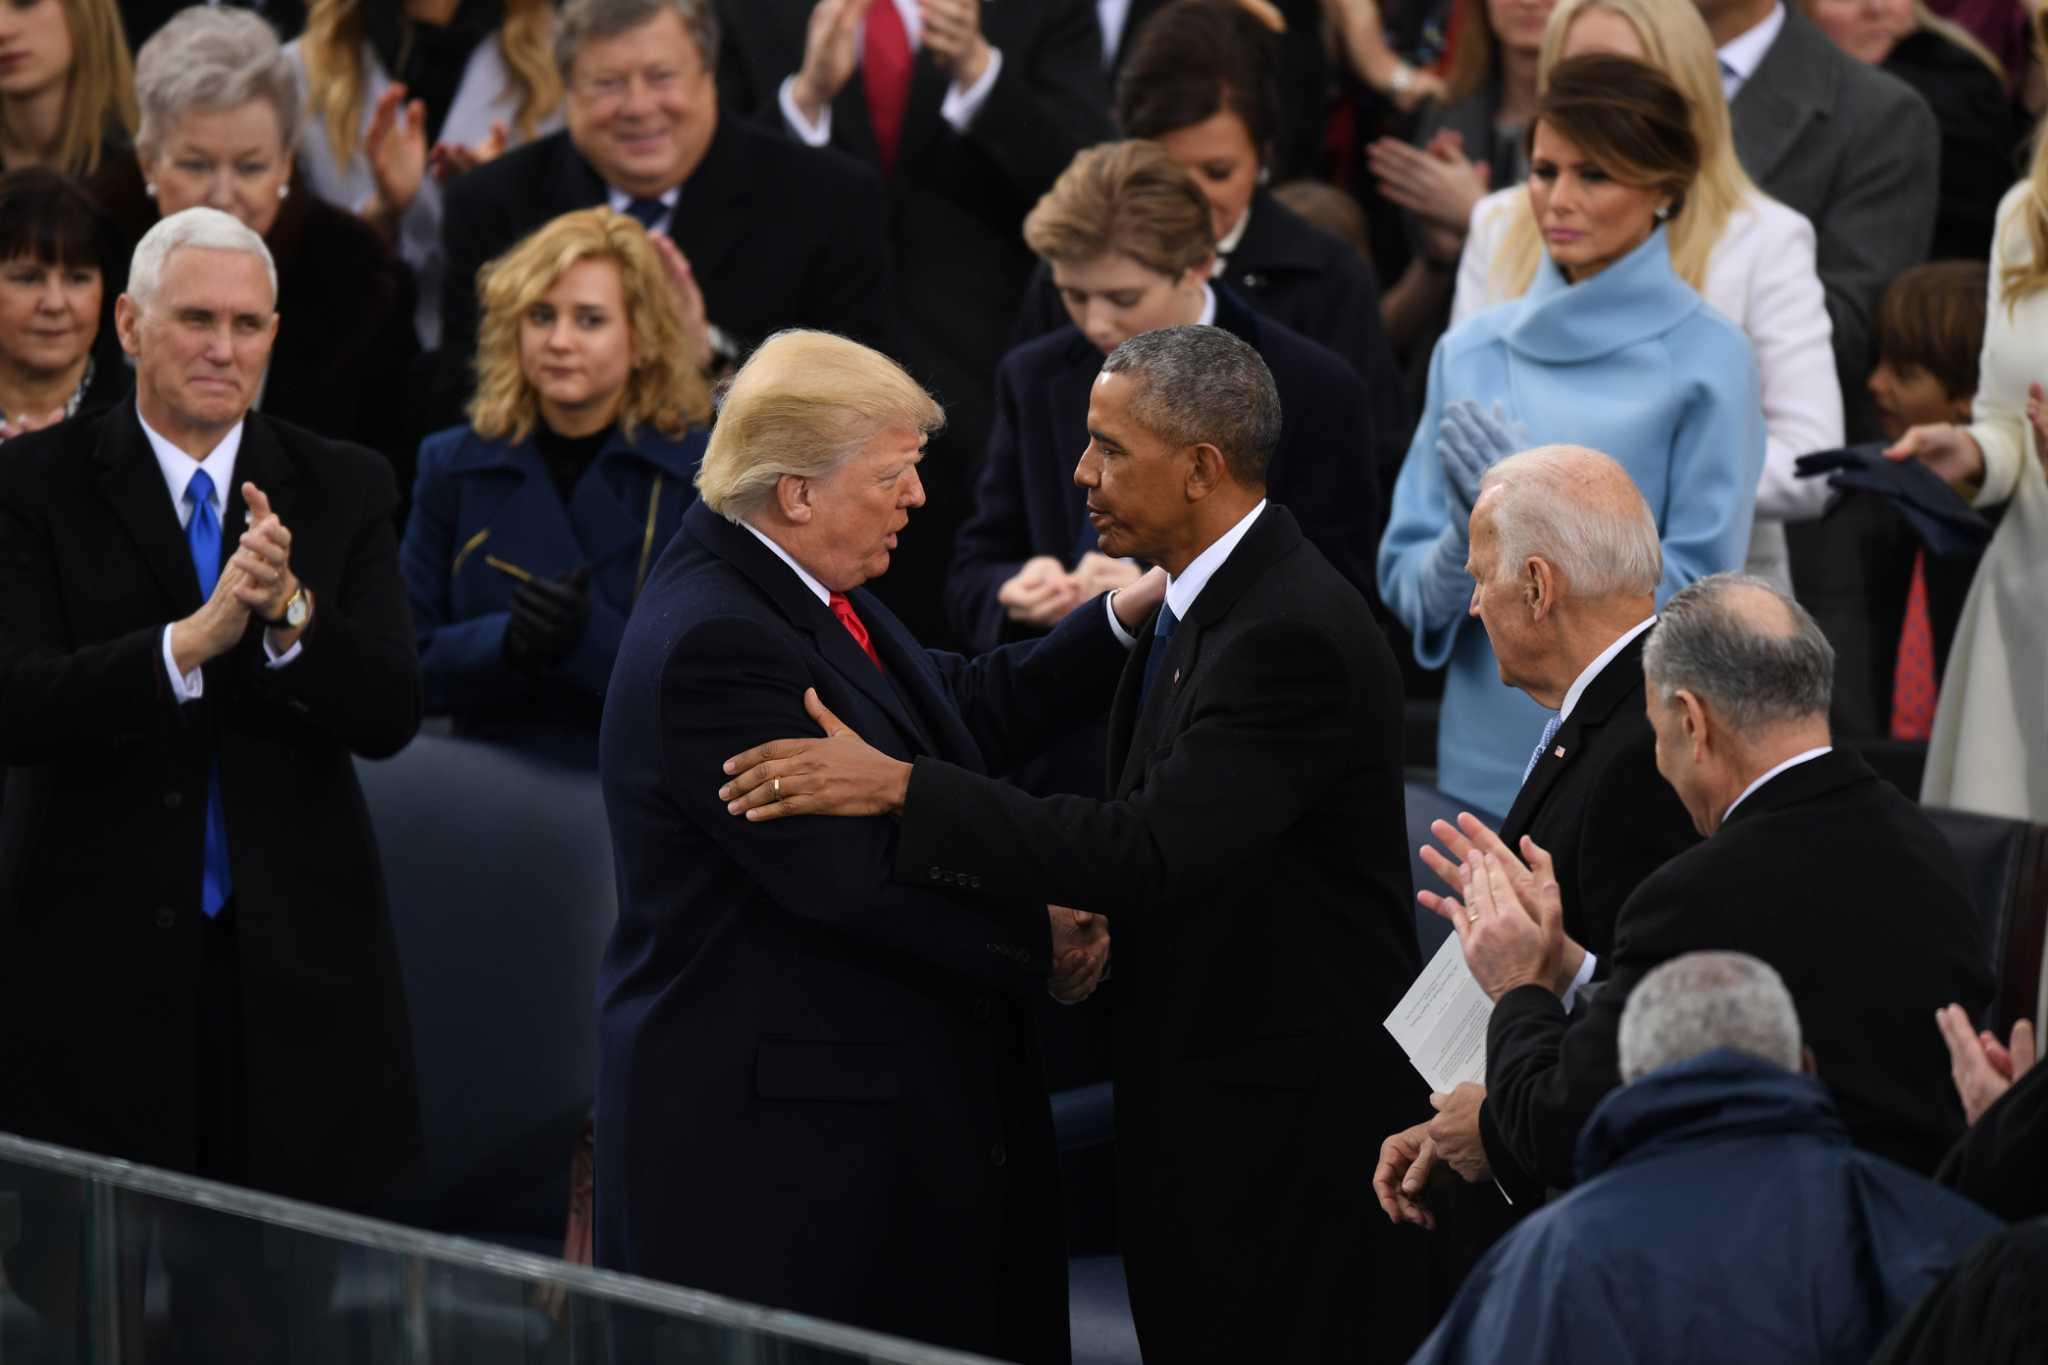 Do Obama, Trump signal shift in future of presidency?